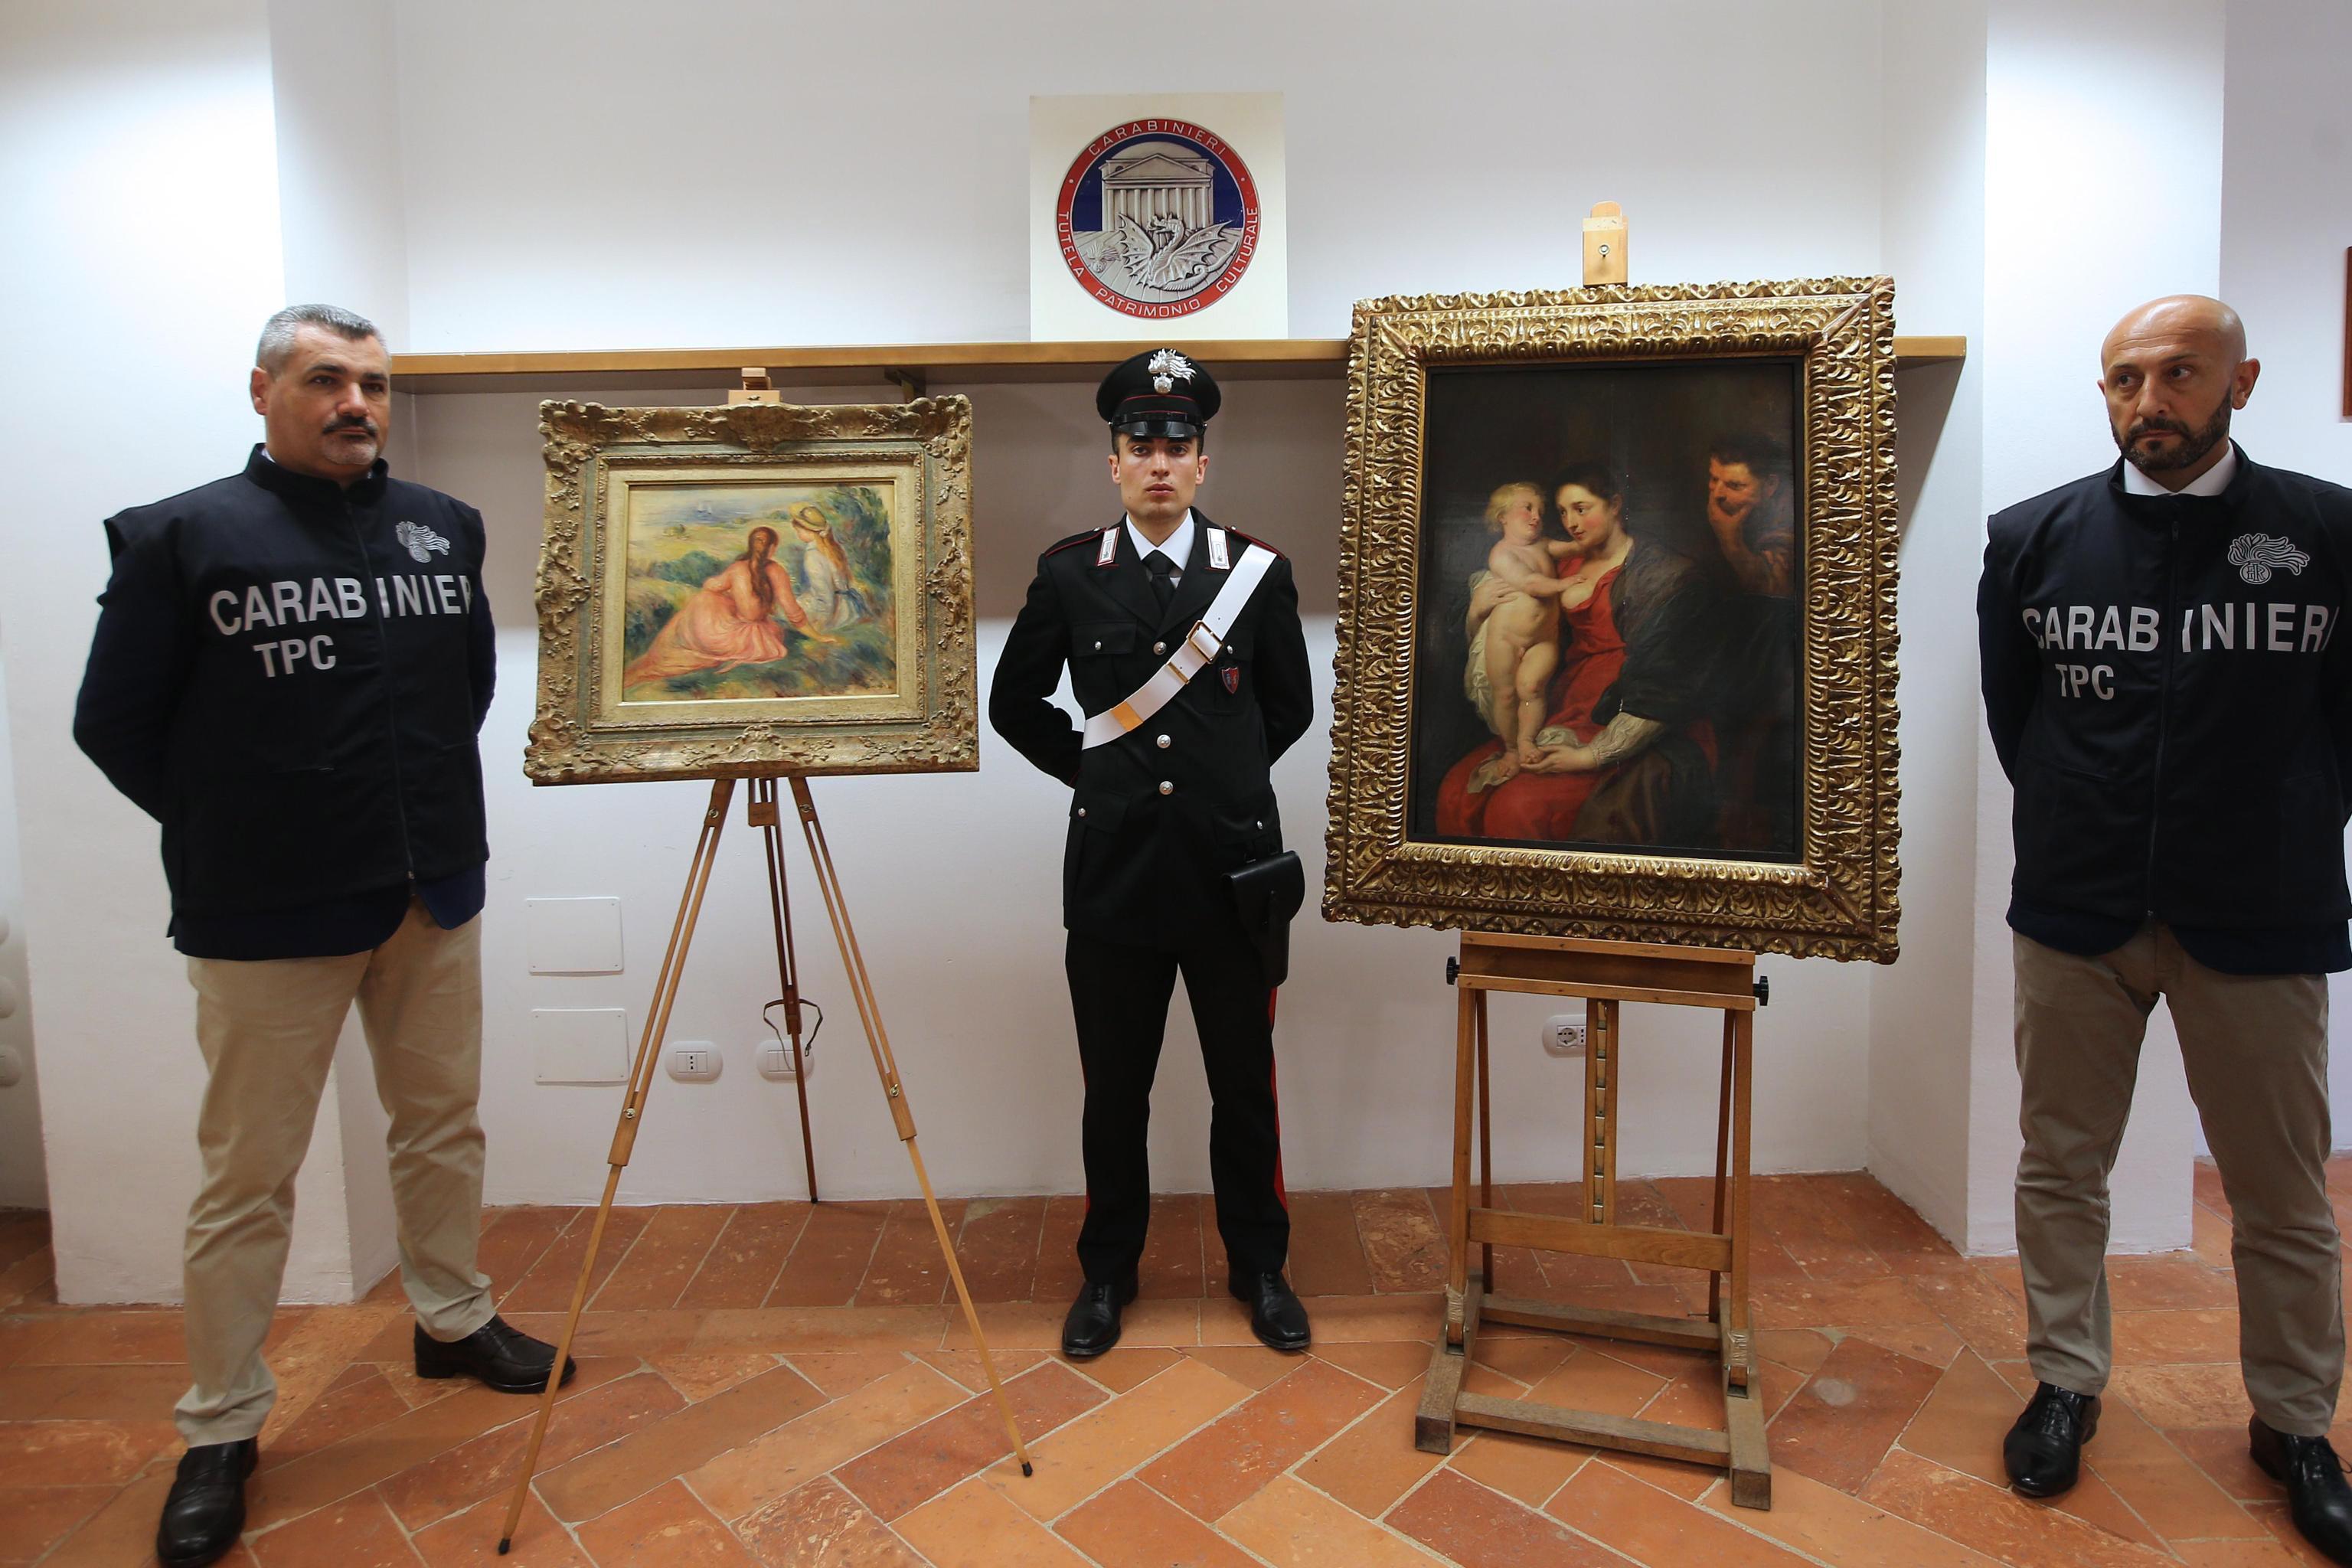 ITALIJA Pronađene ukradene slike Rubensa i Renoira, među osumnjičenima i Hrvat